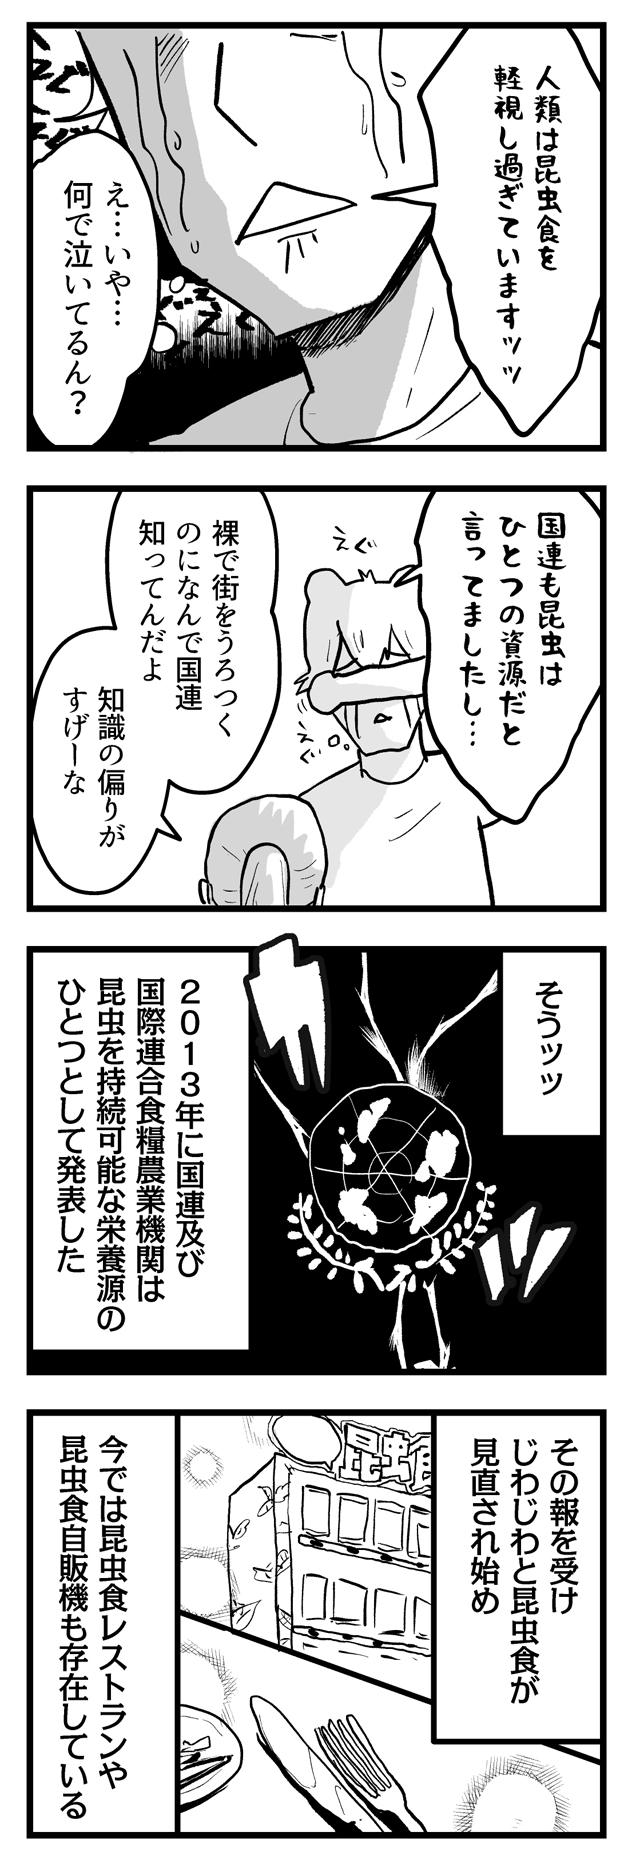 f:id:onaji_me:20210618131827j:plain